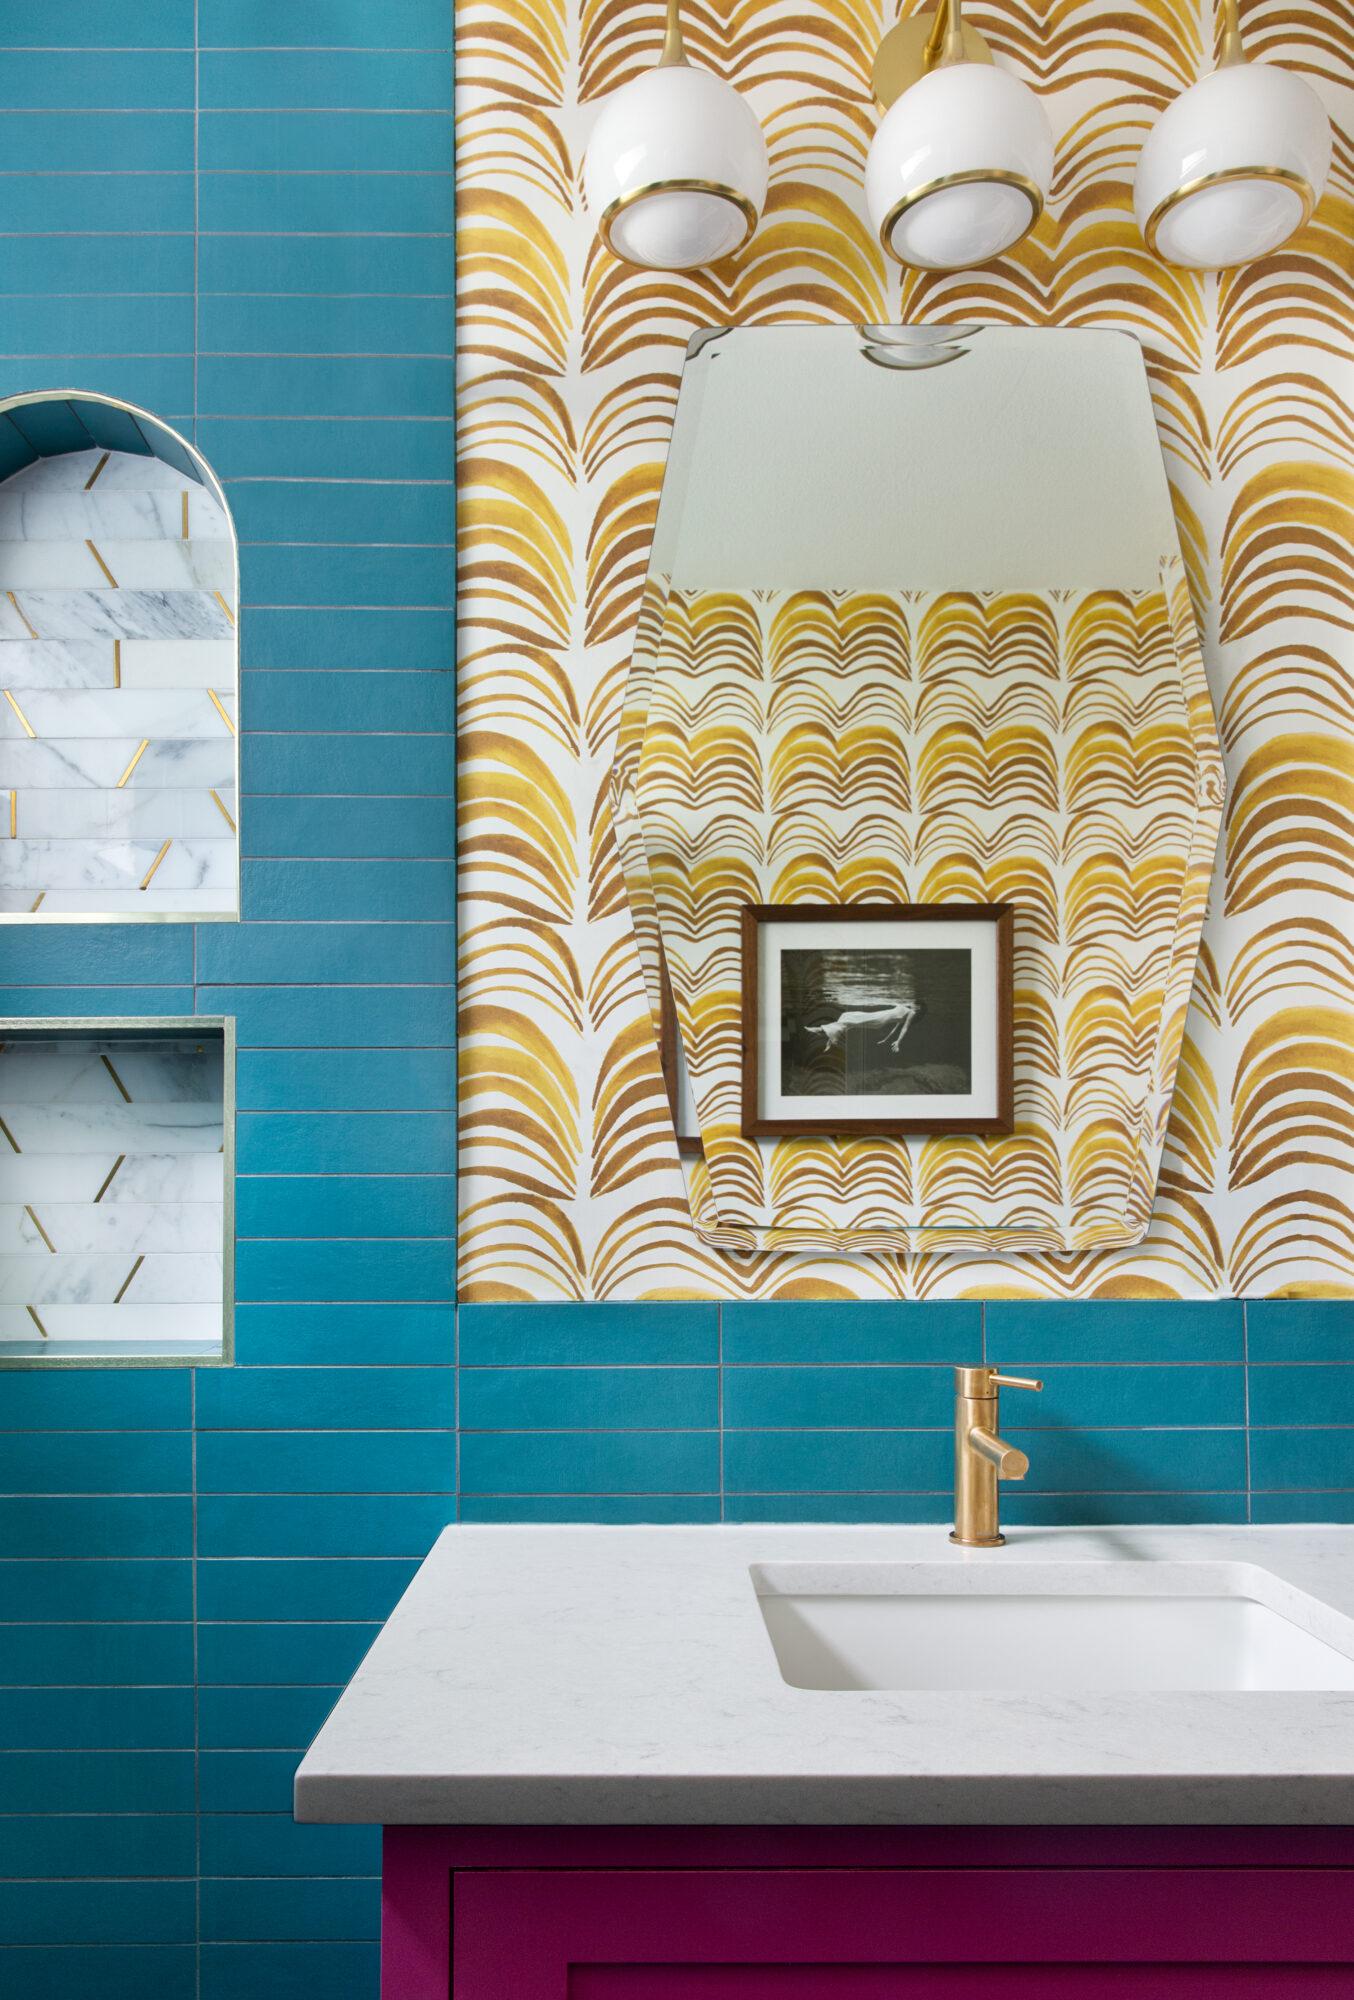 teal and swirled wallpaper bathroom